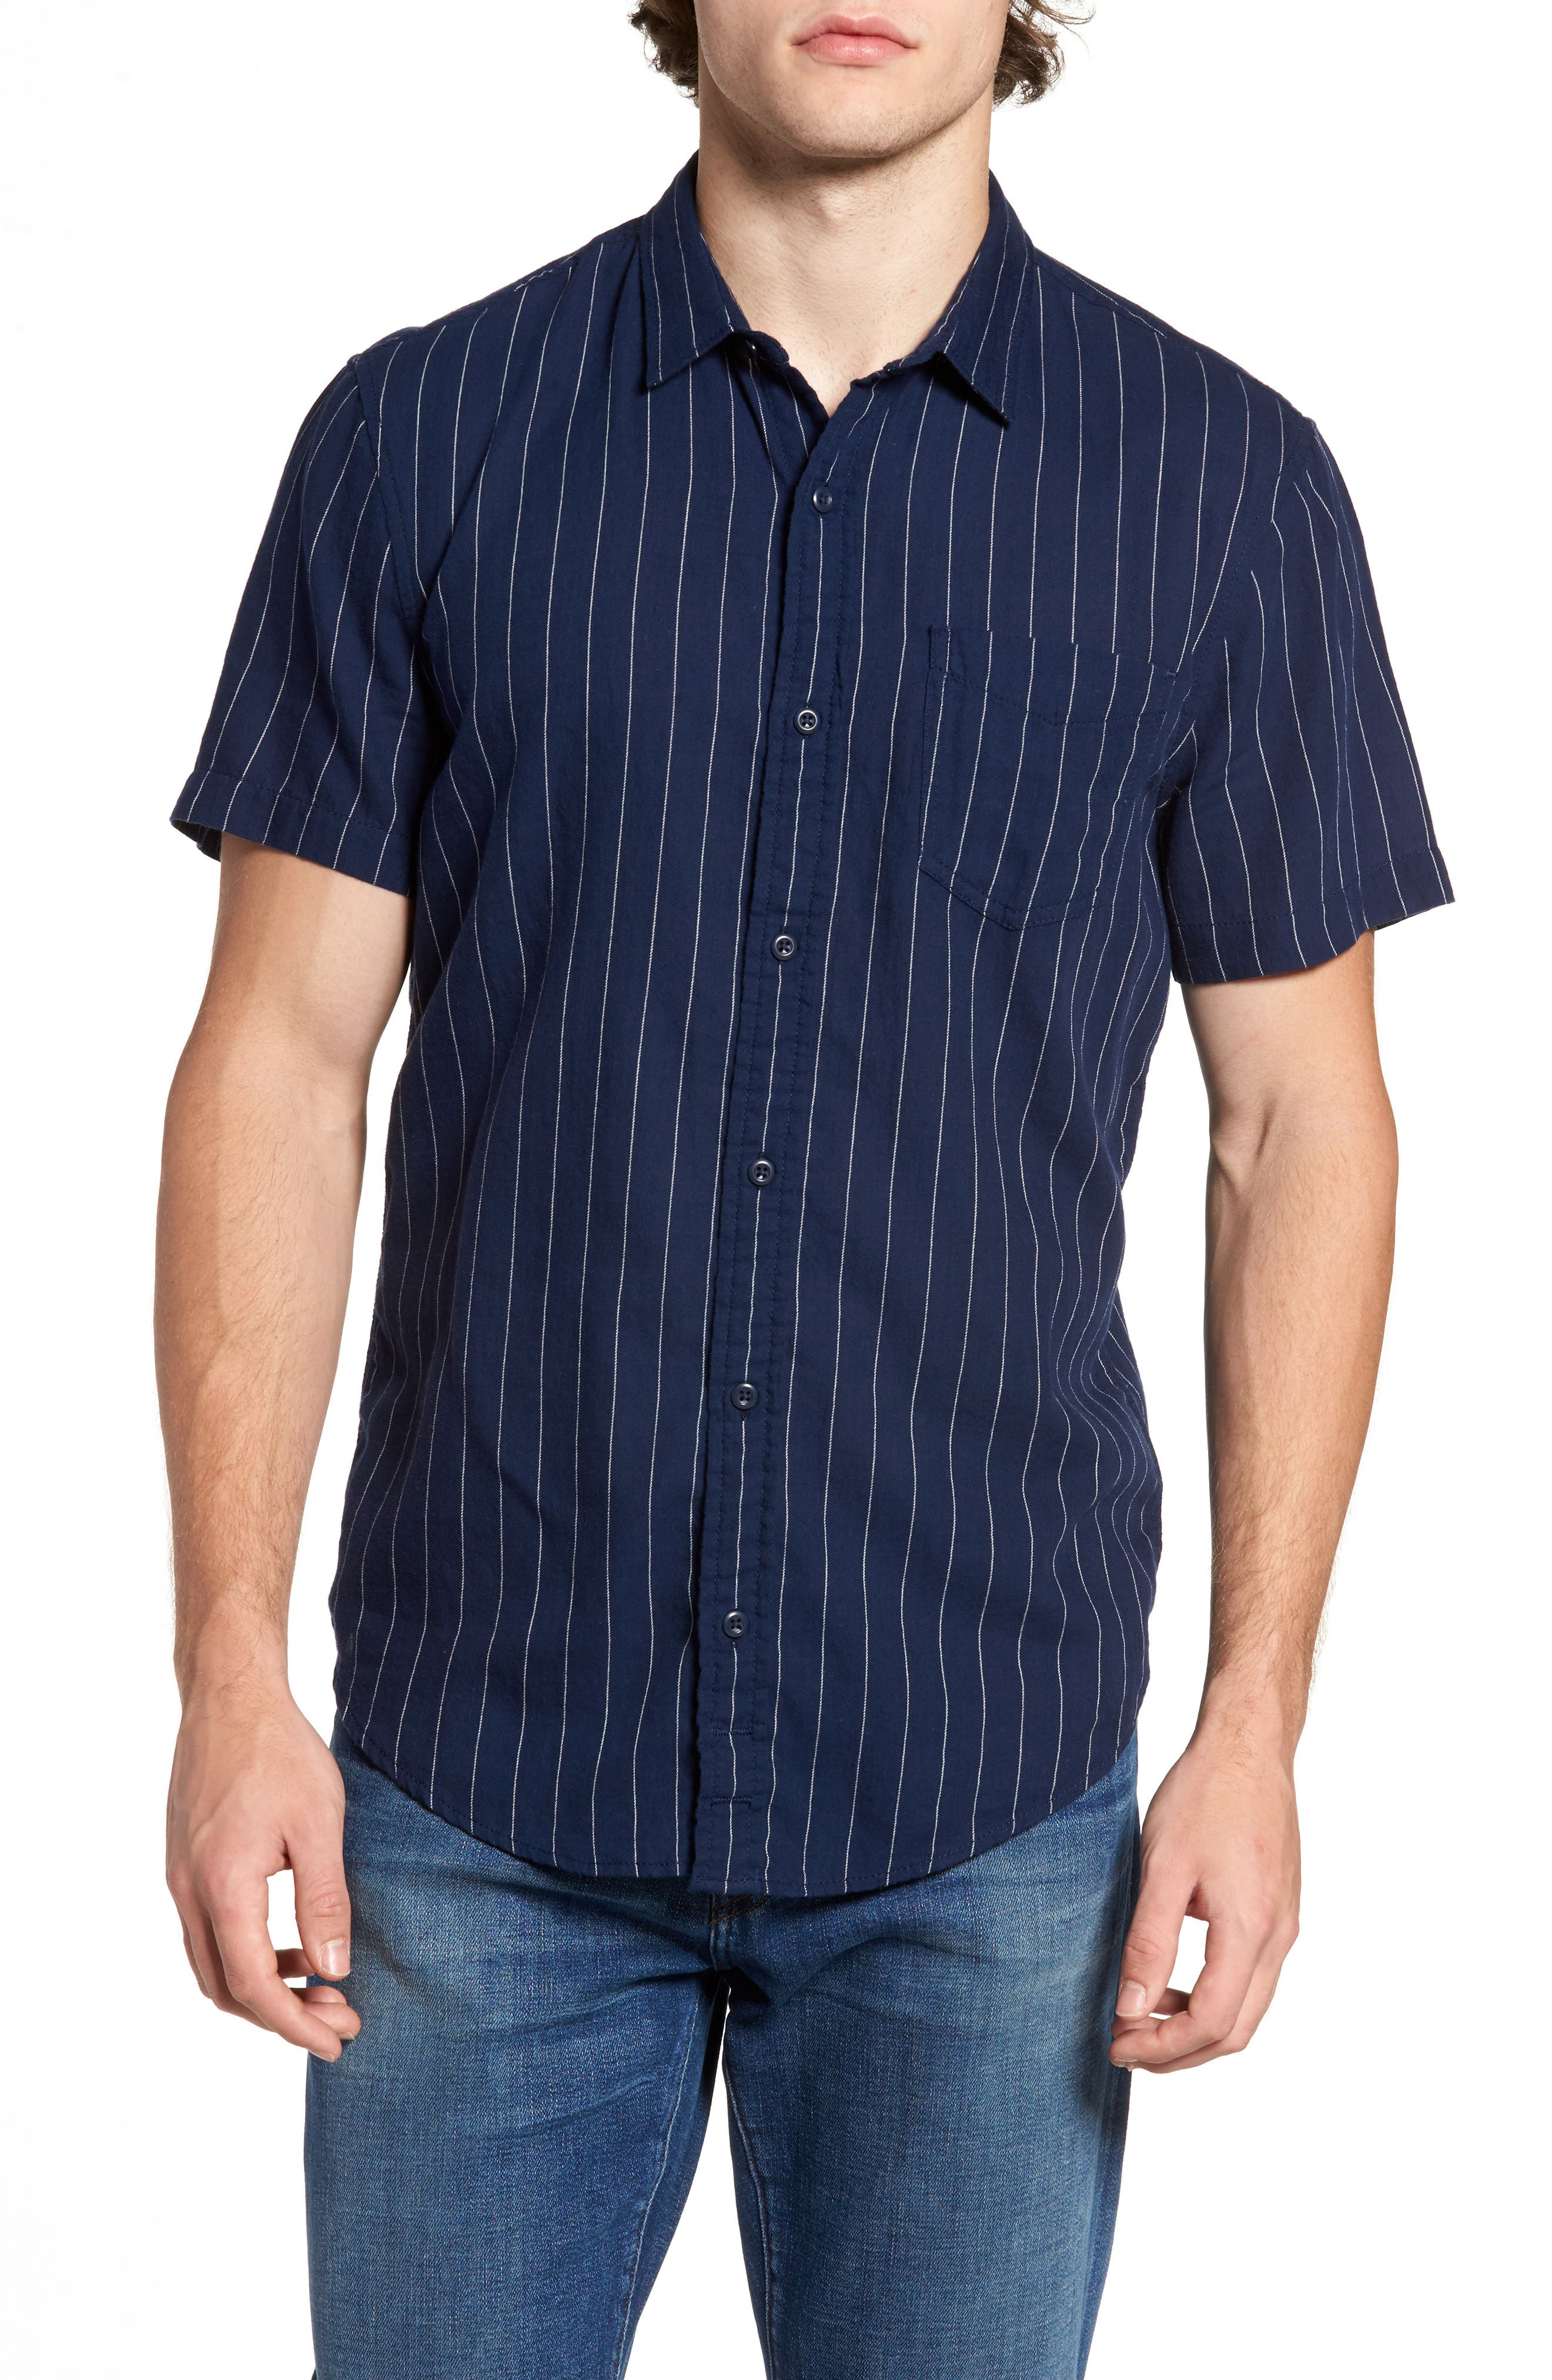 Stripe Twill Shirt,                             Main thumbnail 1, color,                             410